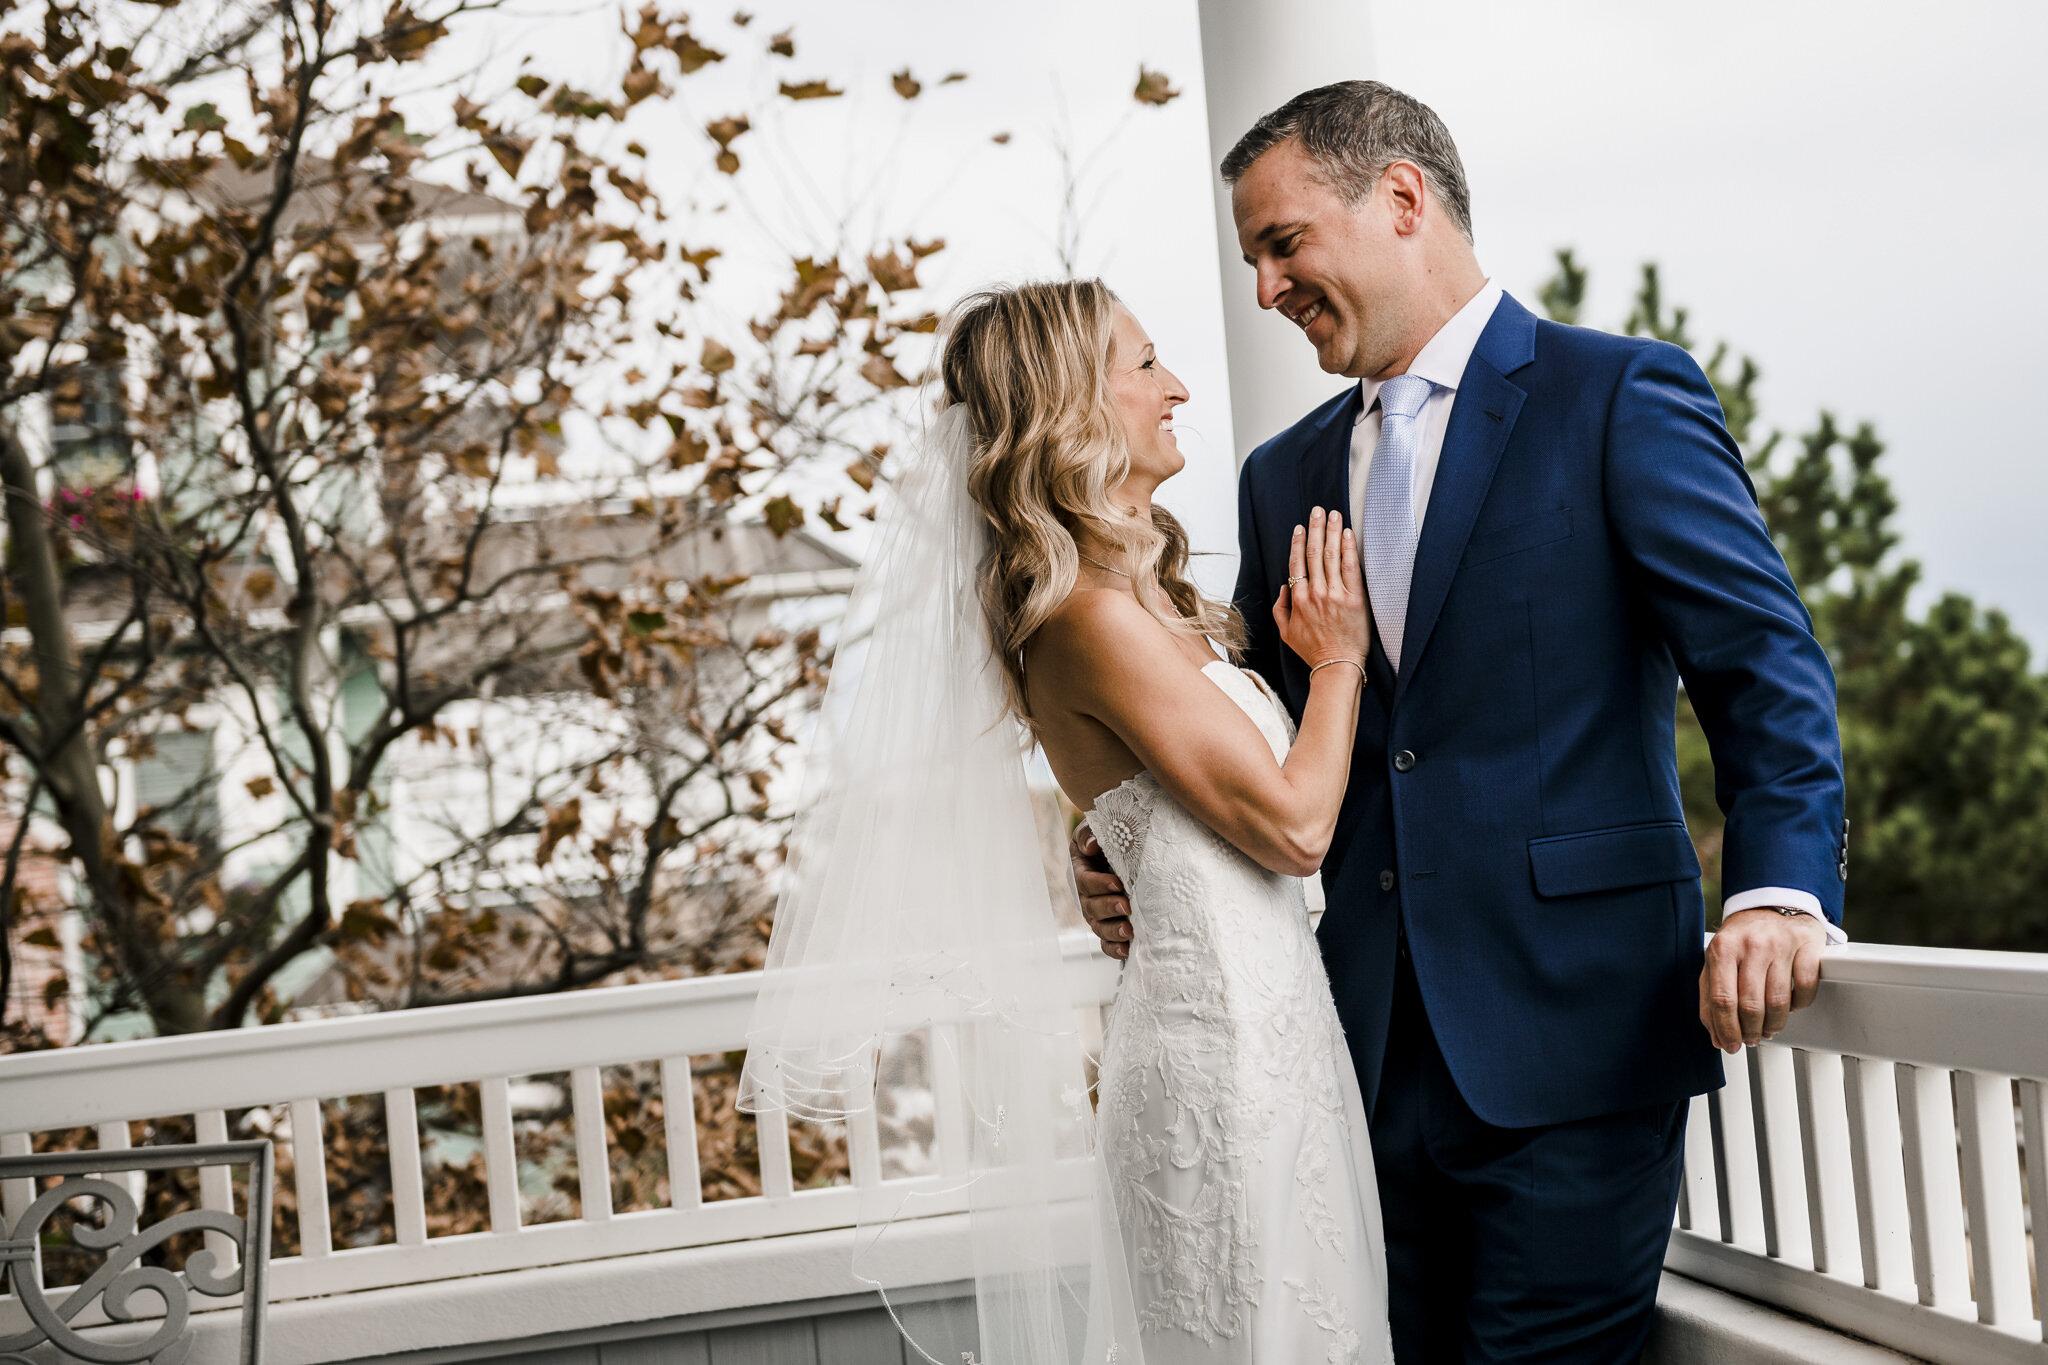 Snell-Ocean-City-Yacht-Club-New-Jersey-Wedding-Photographer-10.JPG